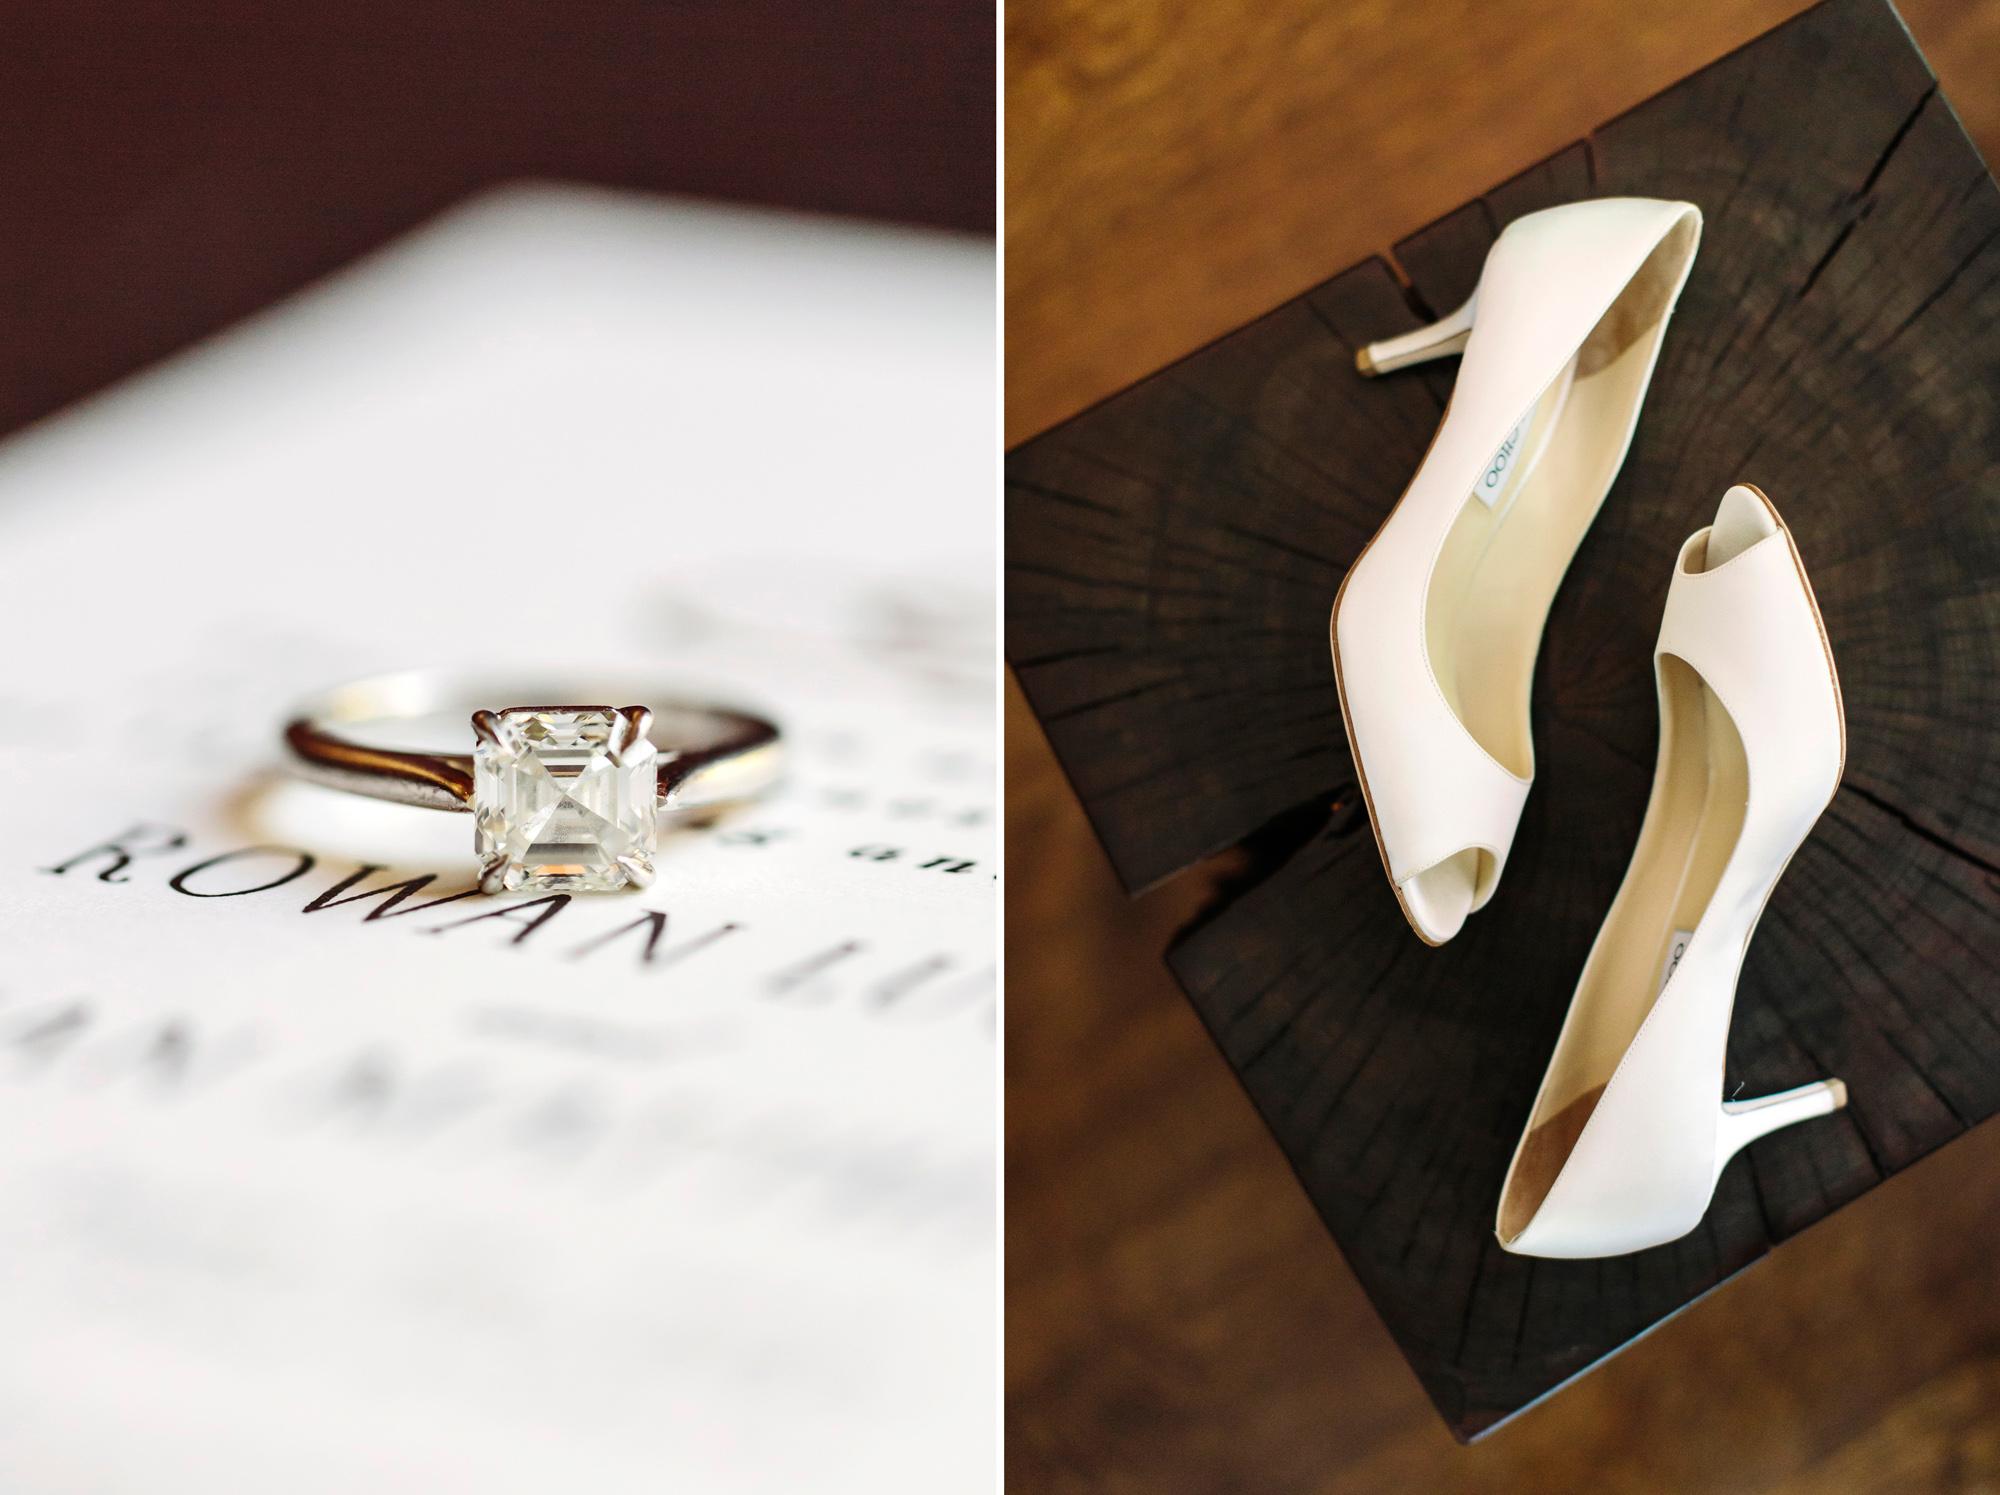 06_Rowan_Brian_The_Roundhouse_Wedding_Beacon_NY_Tanya_Salazar_Photography.jpg